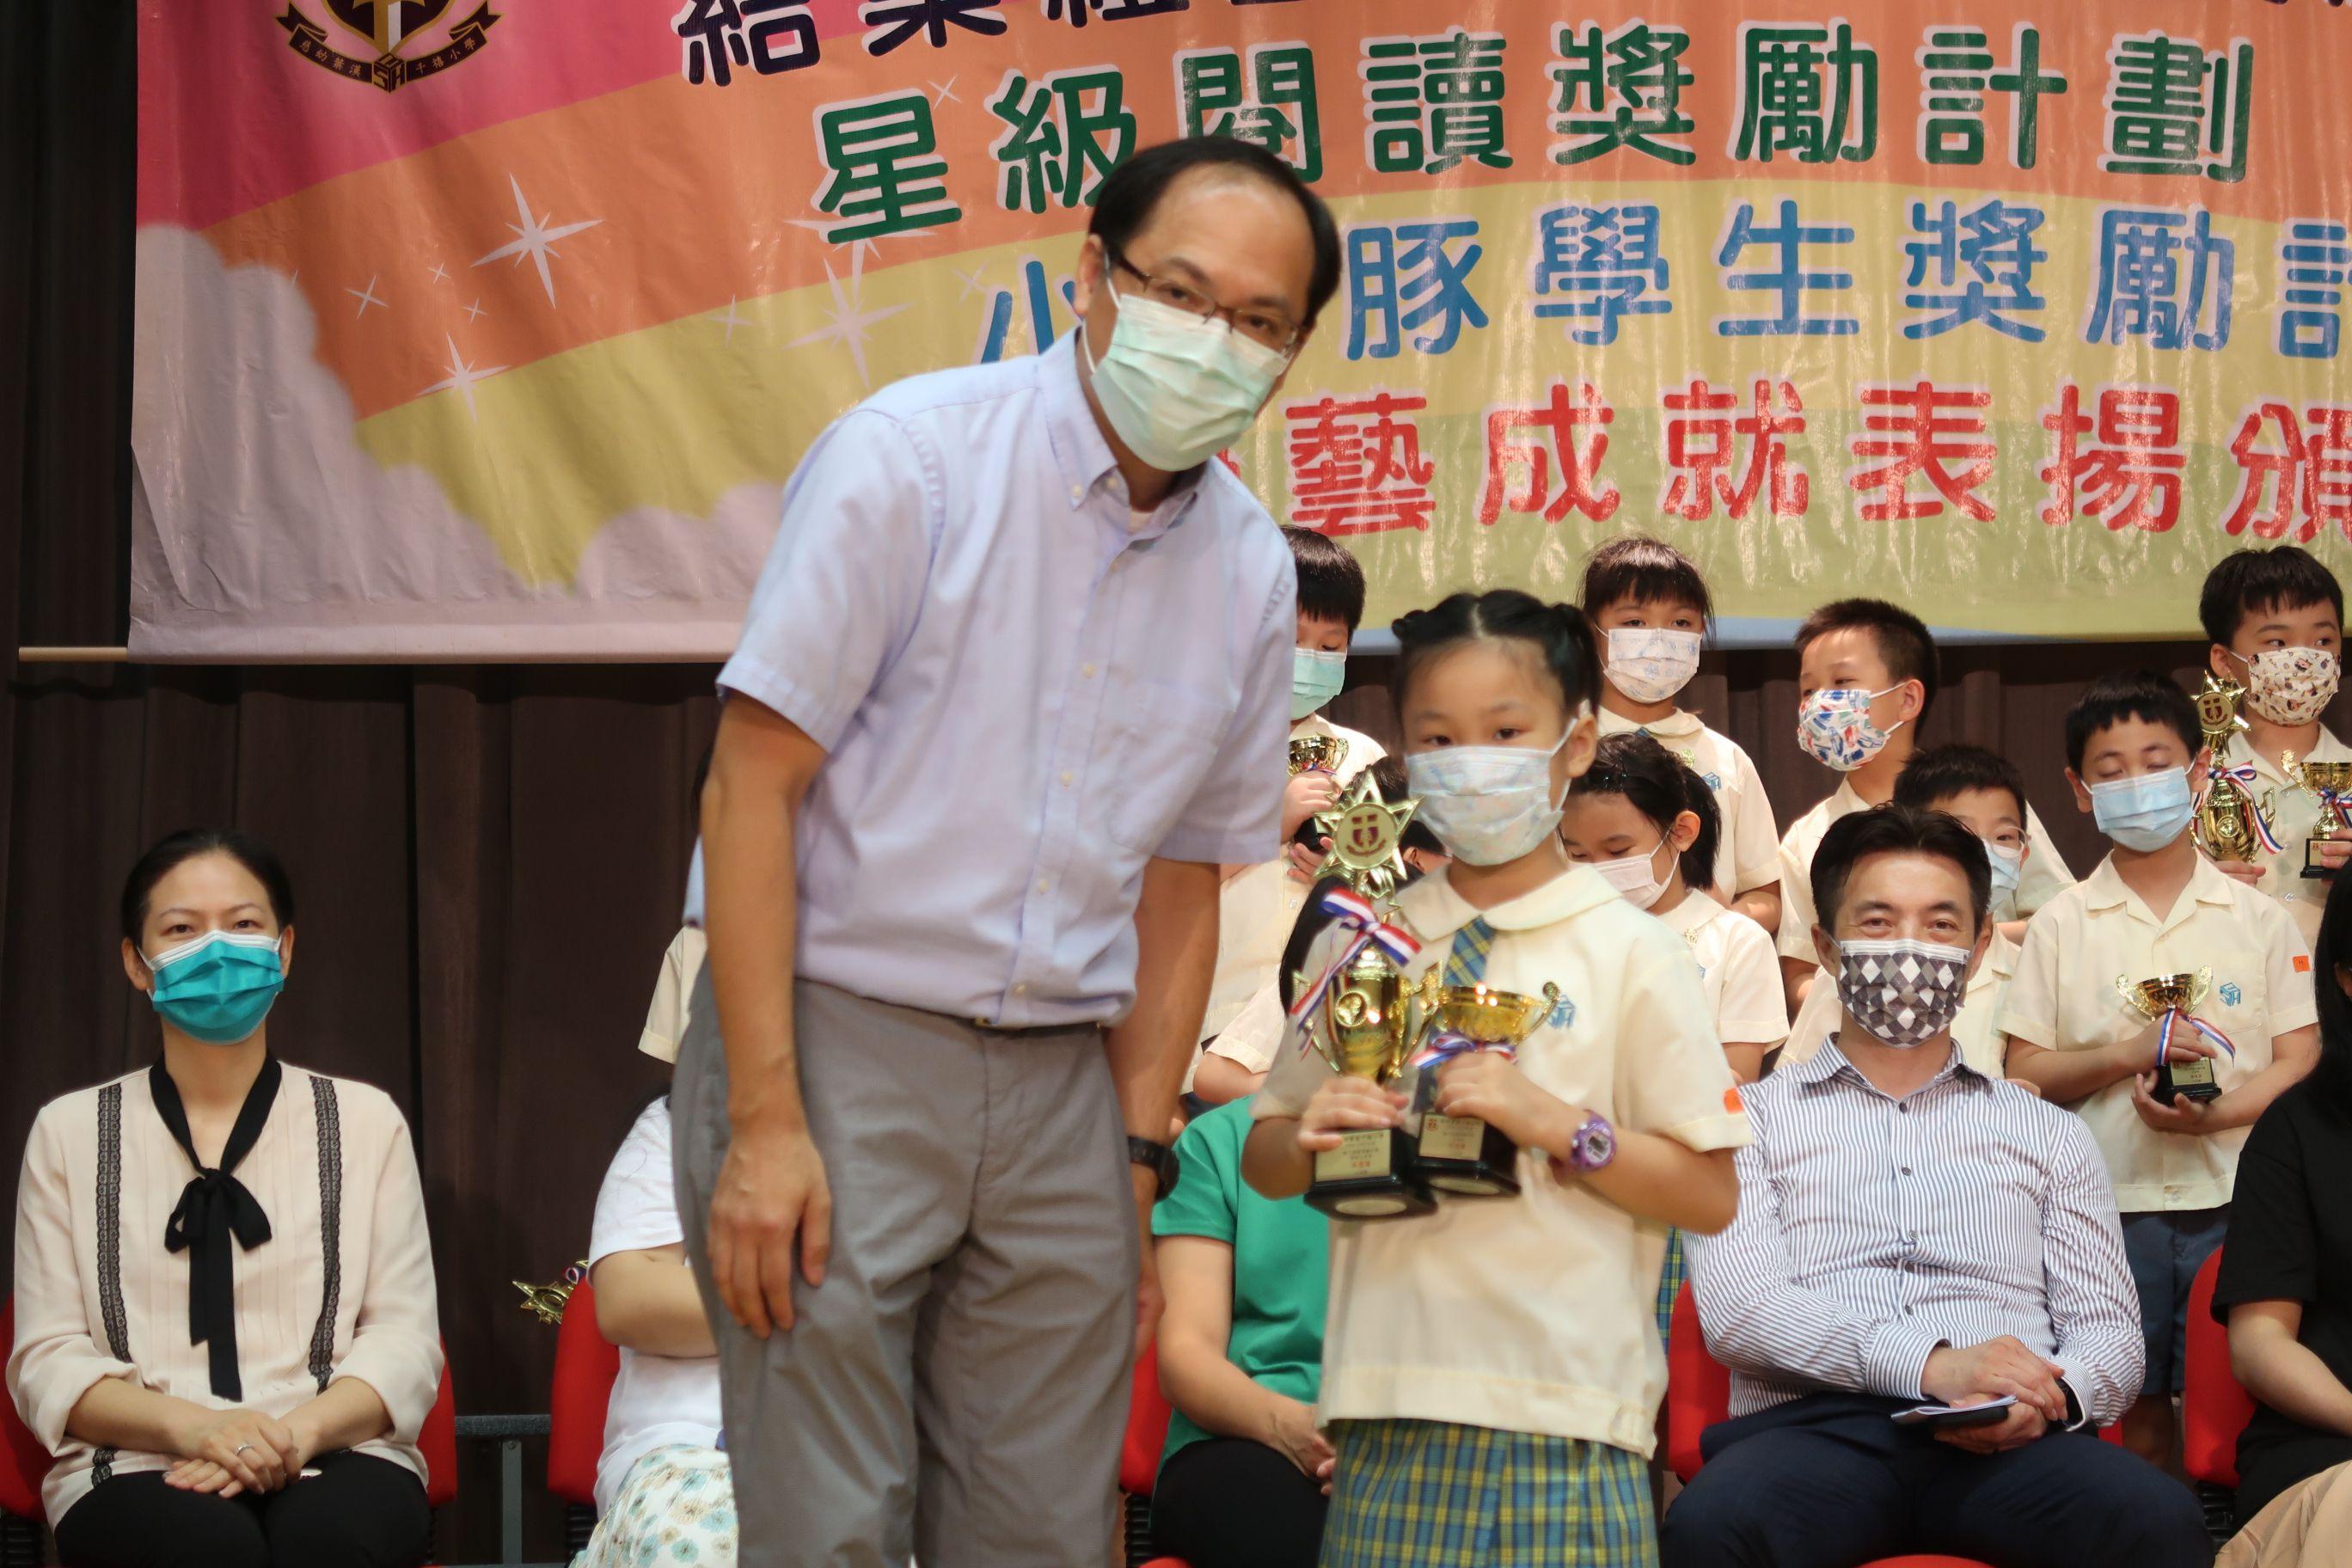 https://syh.edu.hk/sites/default/files/img_5824.jpg